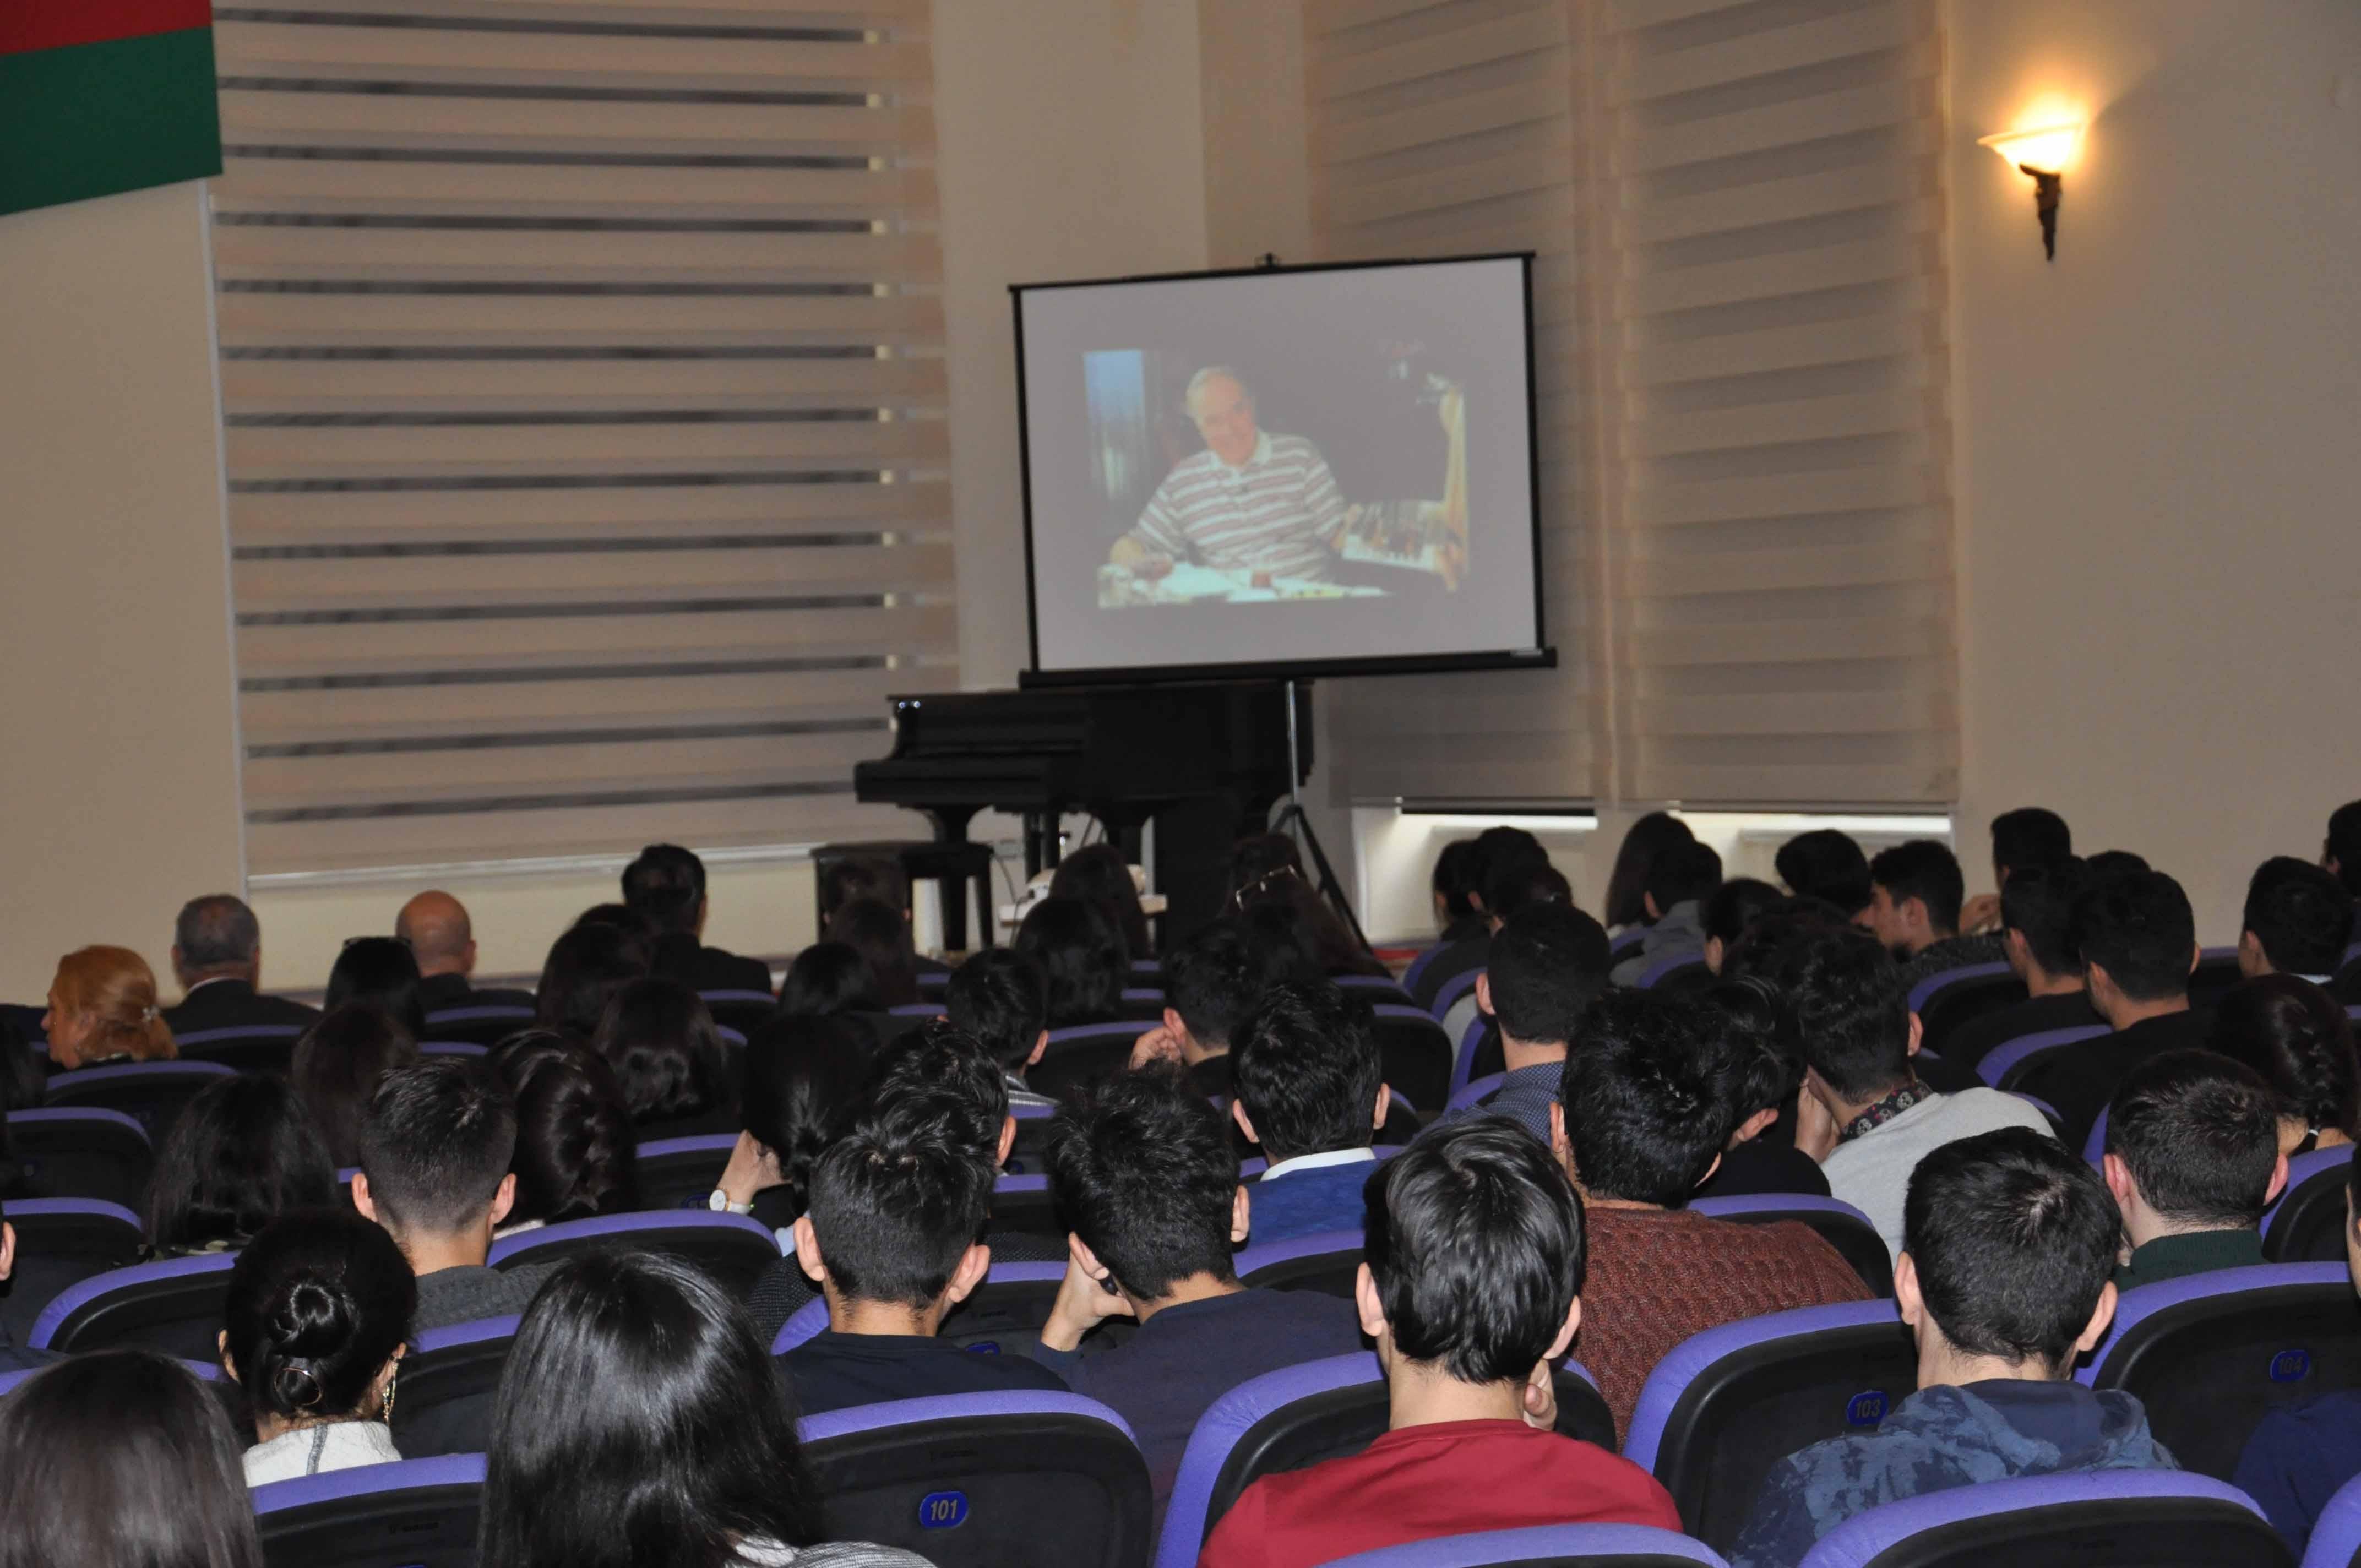 Mayoralty of Baku hosts event marking 14th death anniversary of Heydar Aliyev